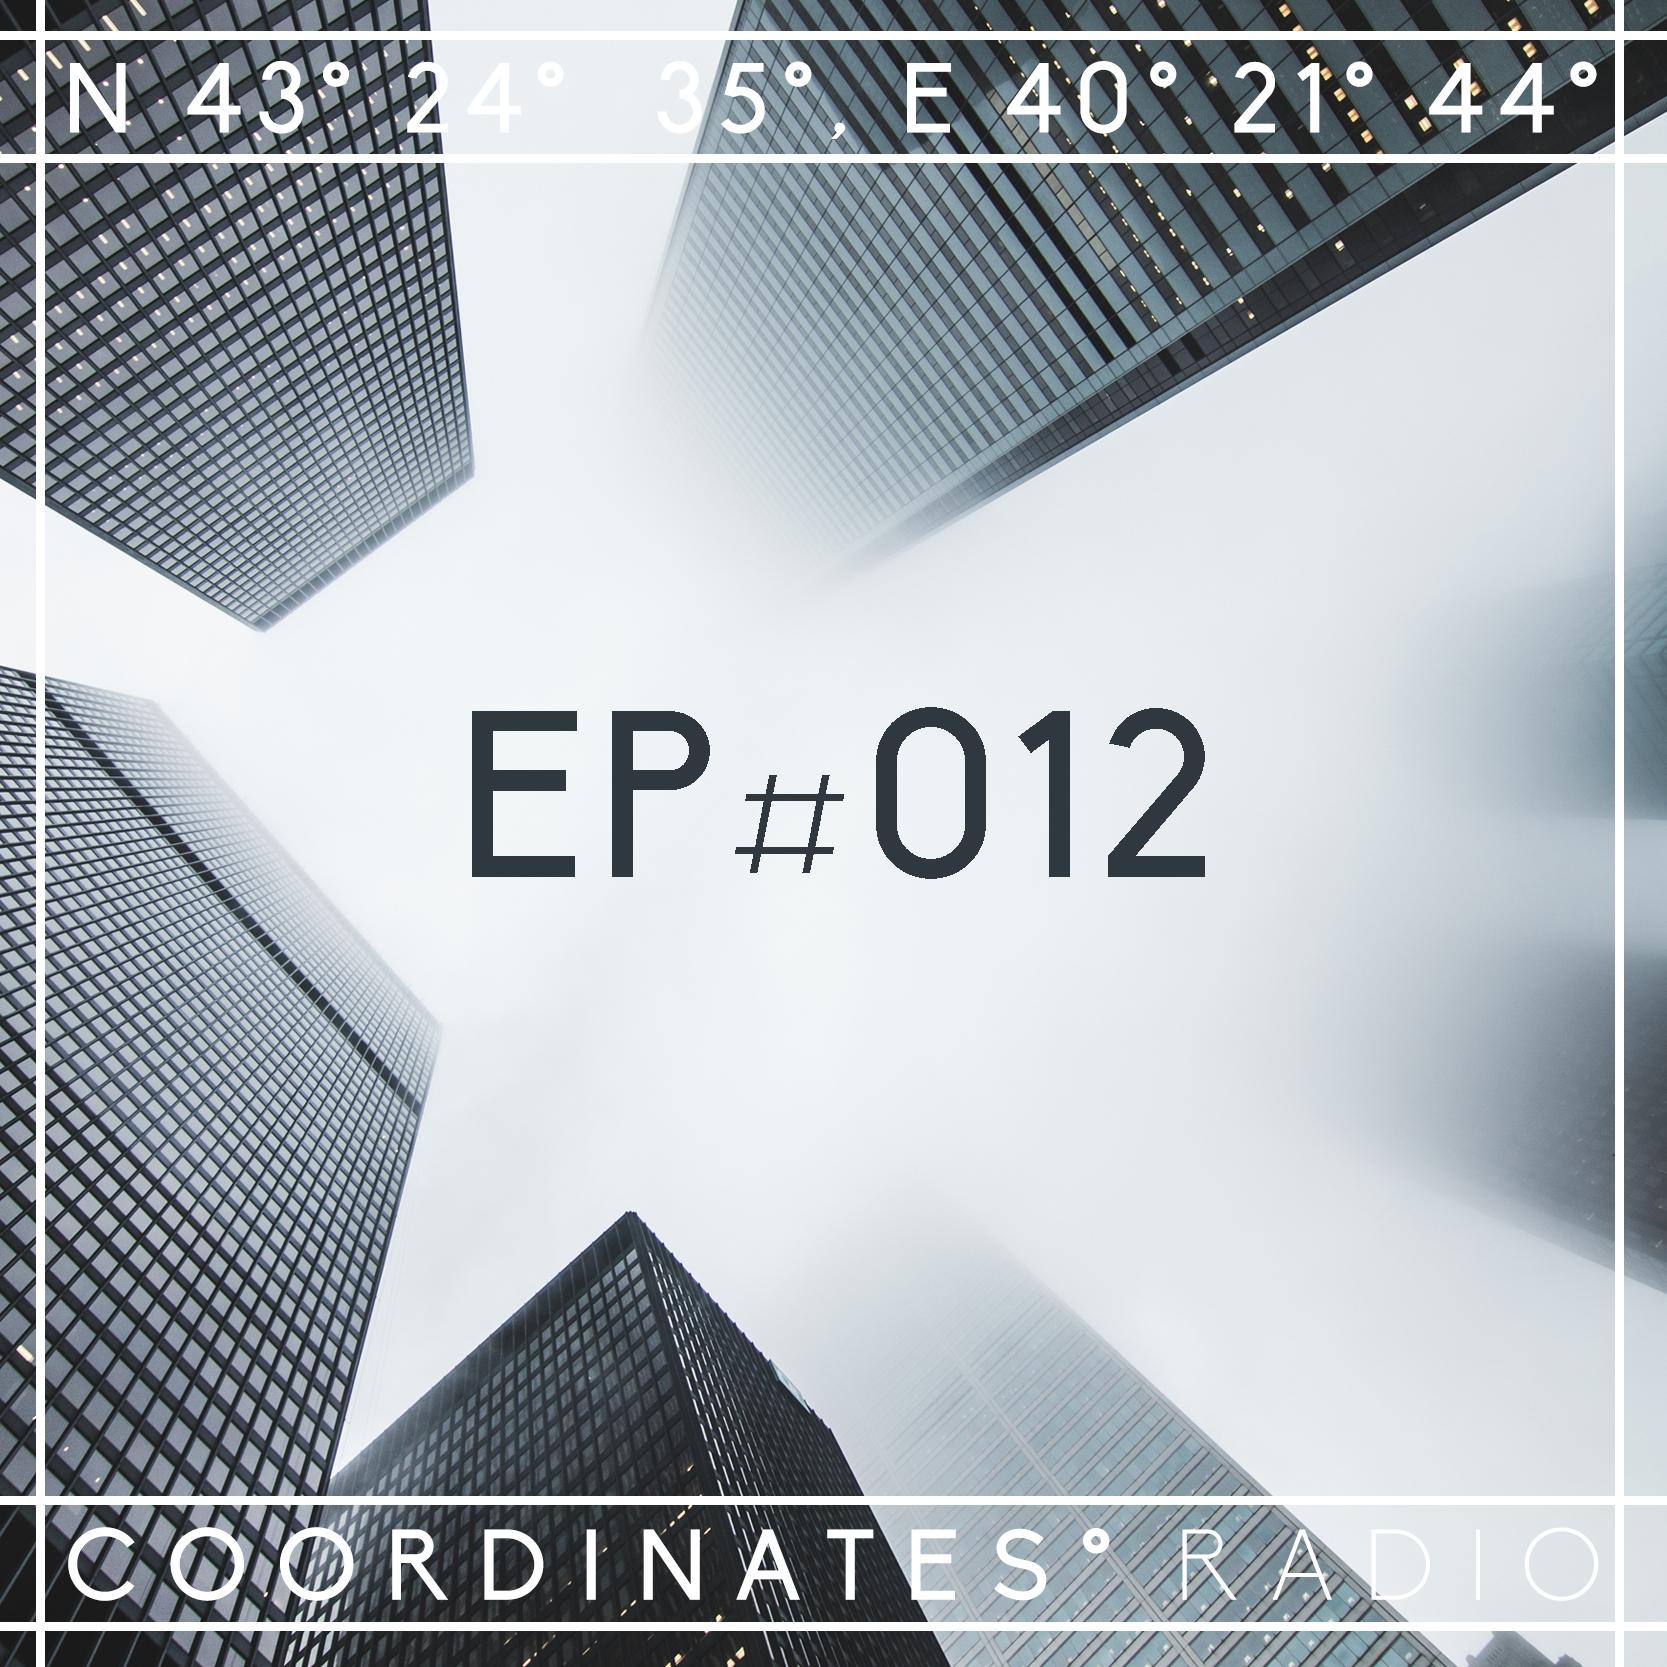 Artwork for EP#012 Leo Levo presents Coordinates° Radio.